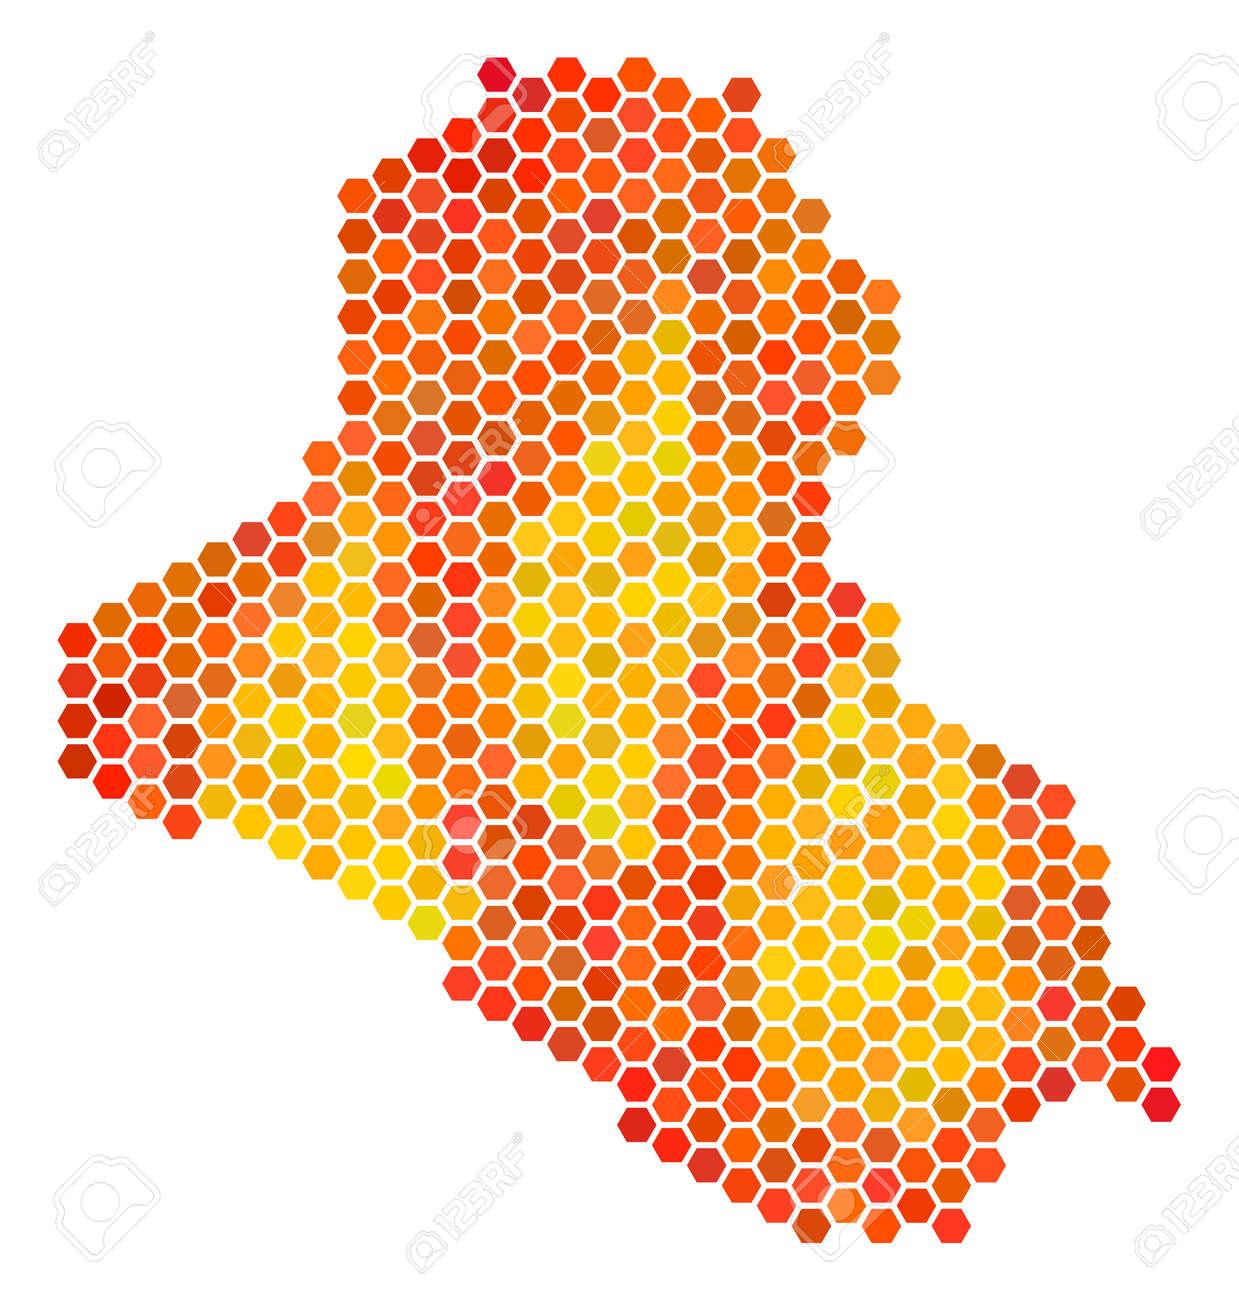 iraq map vector hex tile territory scheme using bright orange